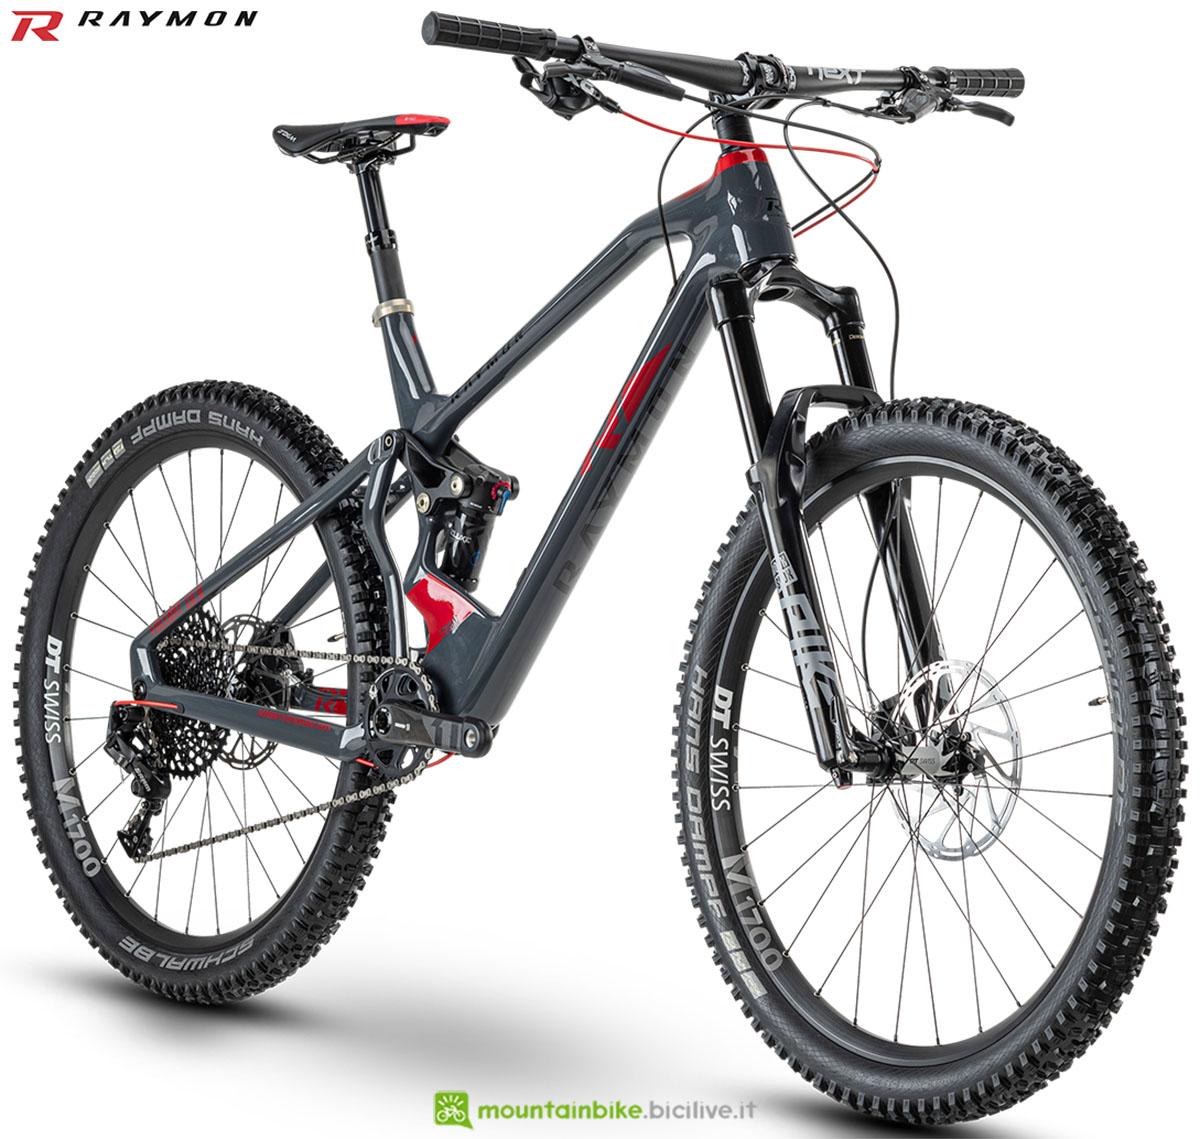 Una bici mtb R Raymon Fullray 10.0 2020